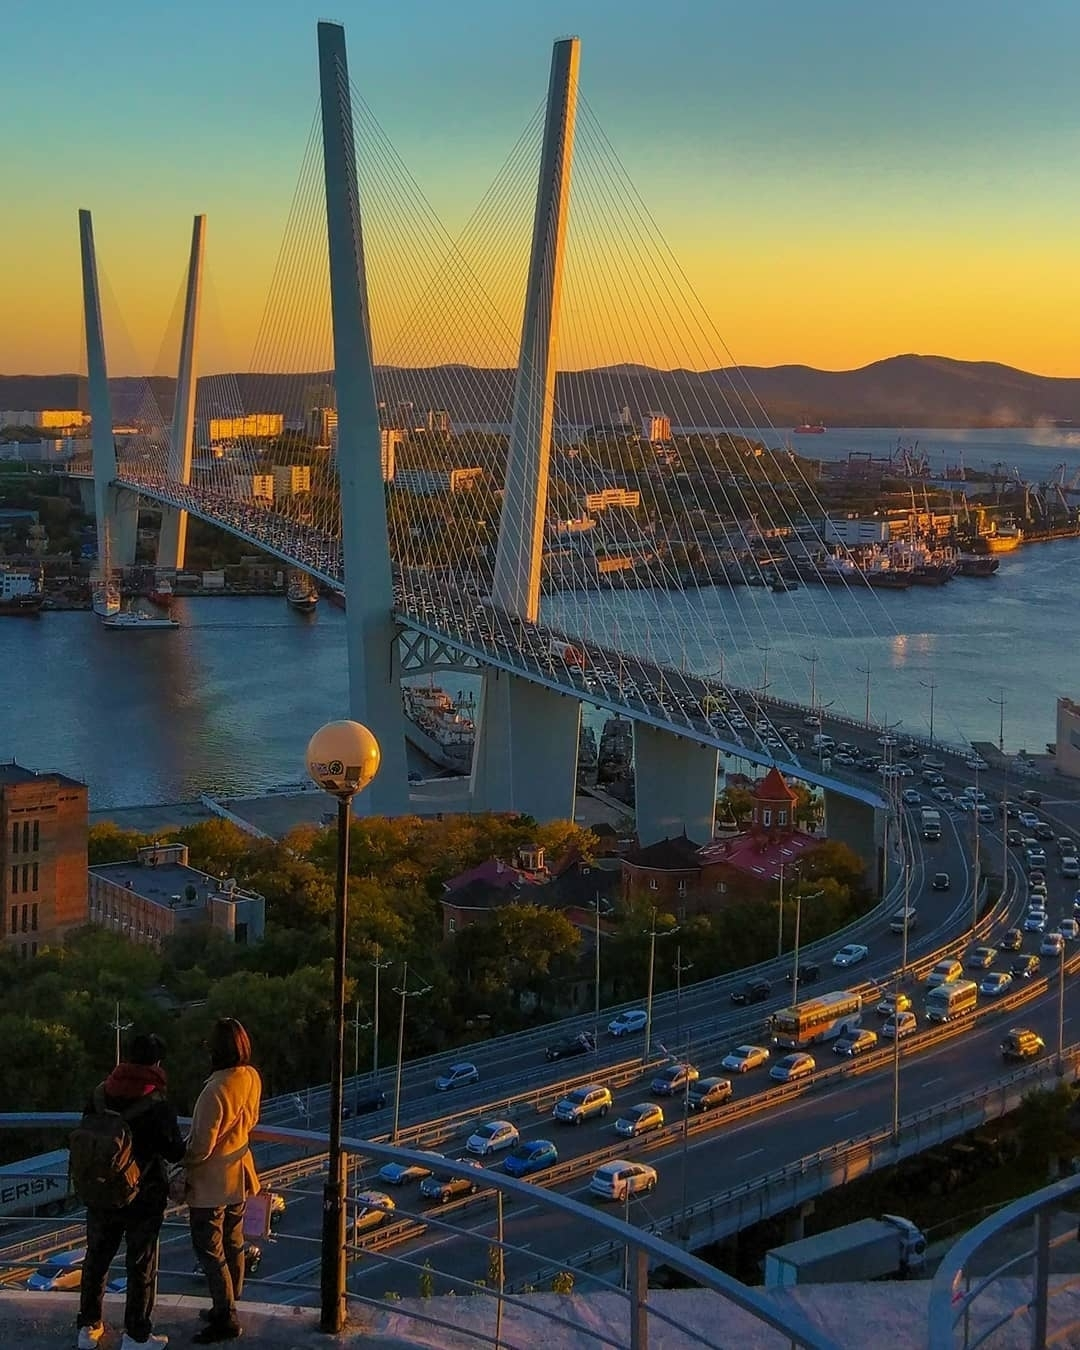 Обои дорожки, Корабли, Владивосток, сопки, дома, россия. Города foto 8